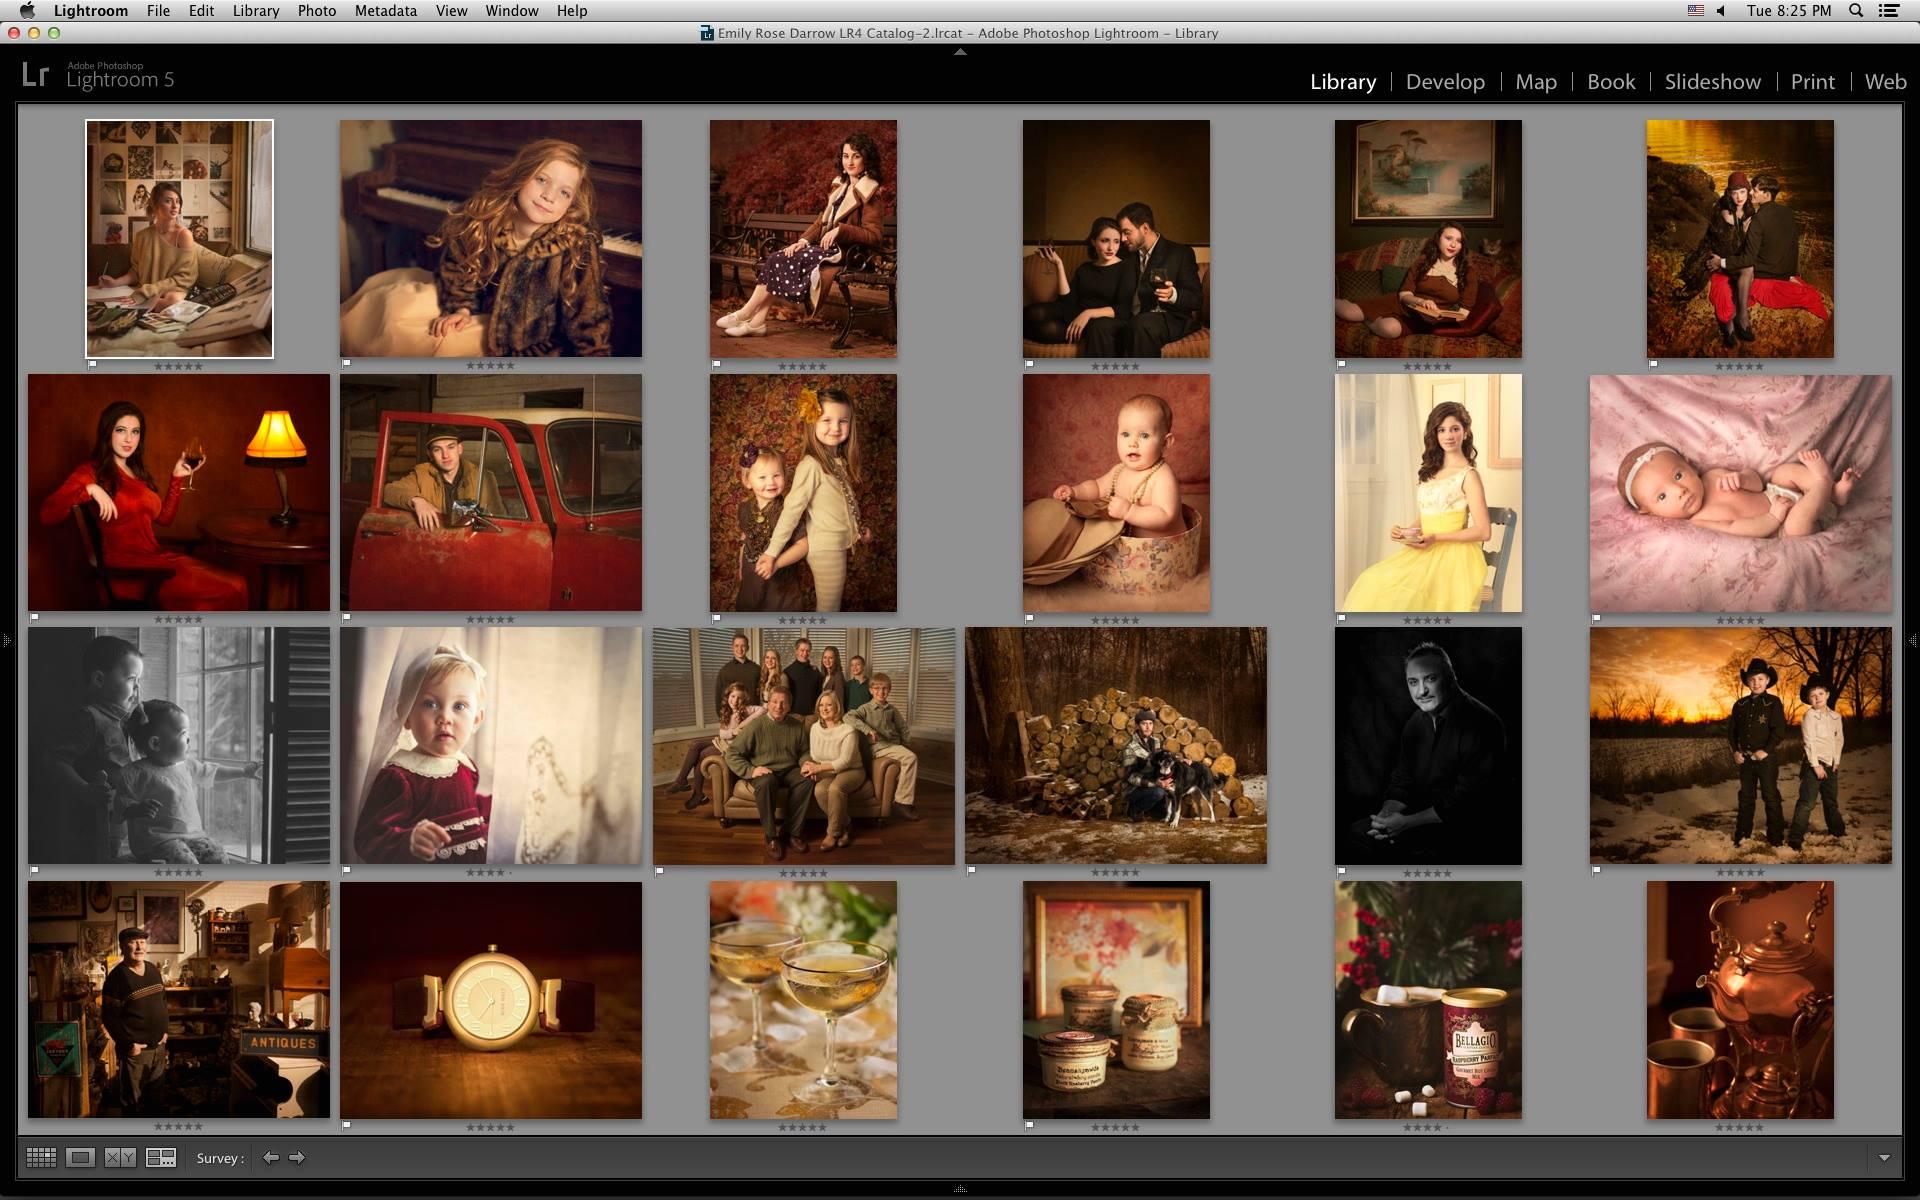 My final portfolio as it was presented.